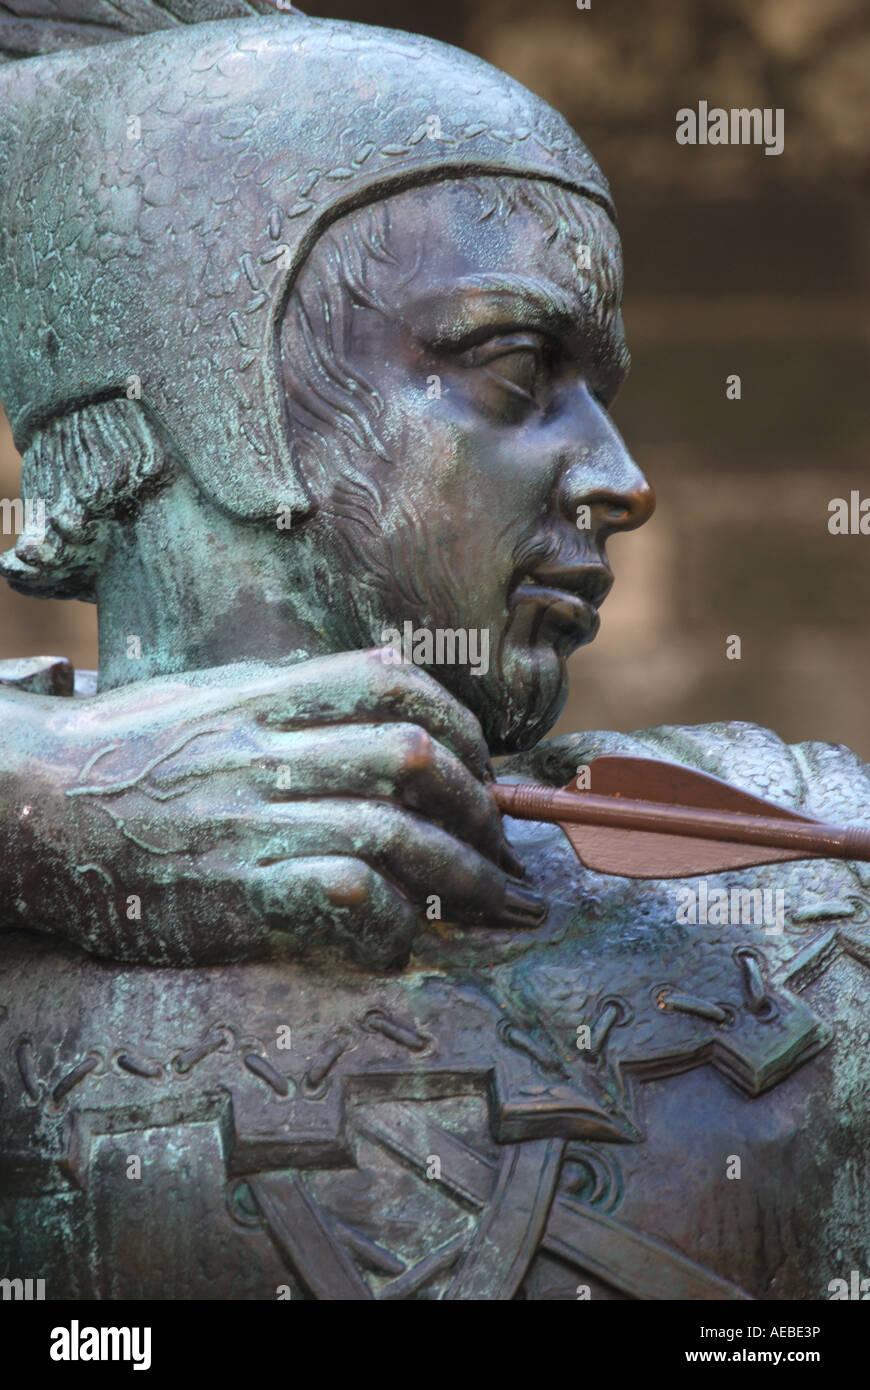 Robin Hood Statue, Nottingham Castle, Nottingham, Nottinghamshire, England, United Kingdom - Stock Image